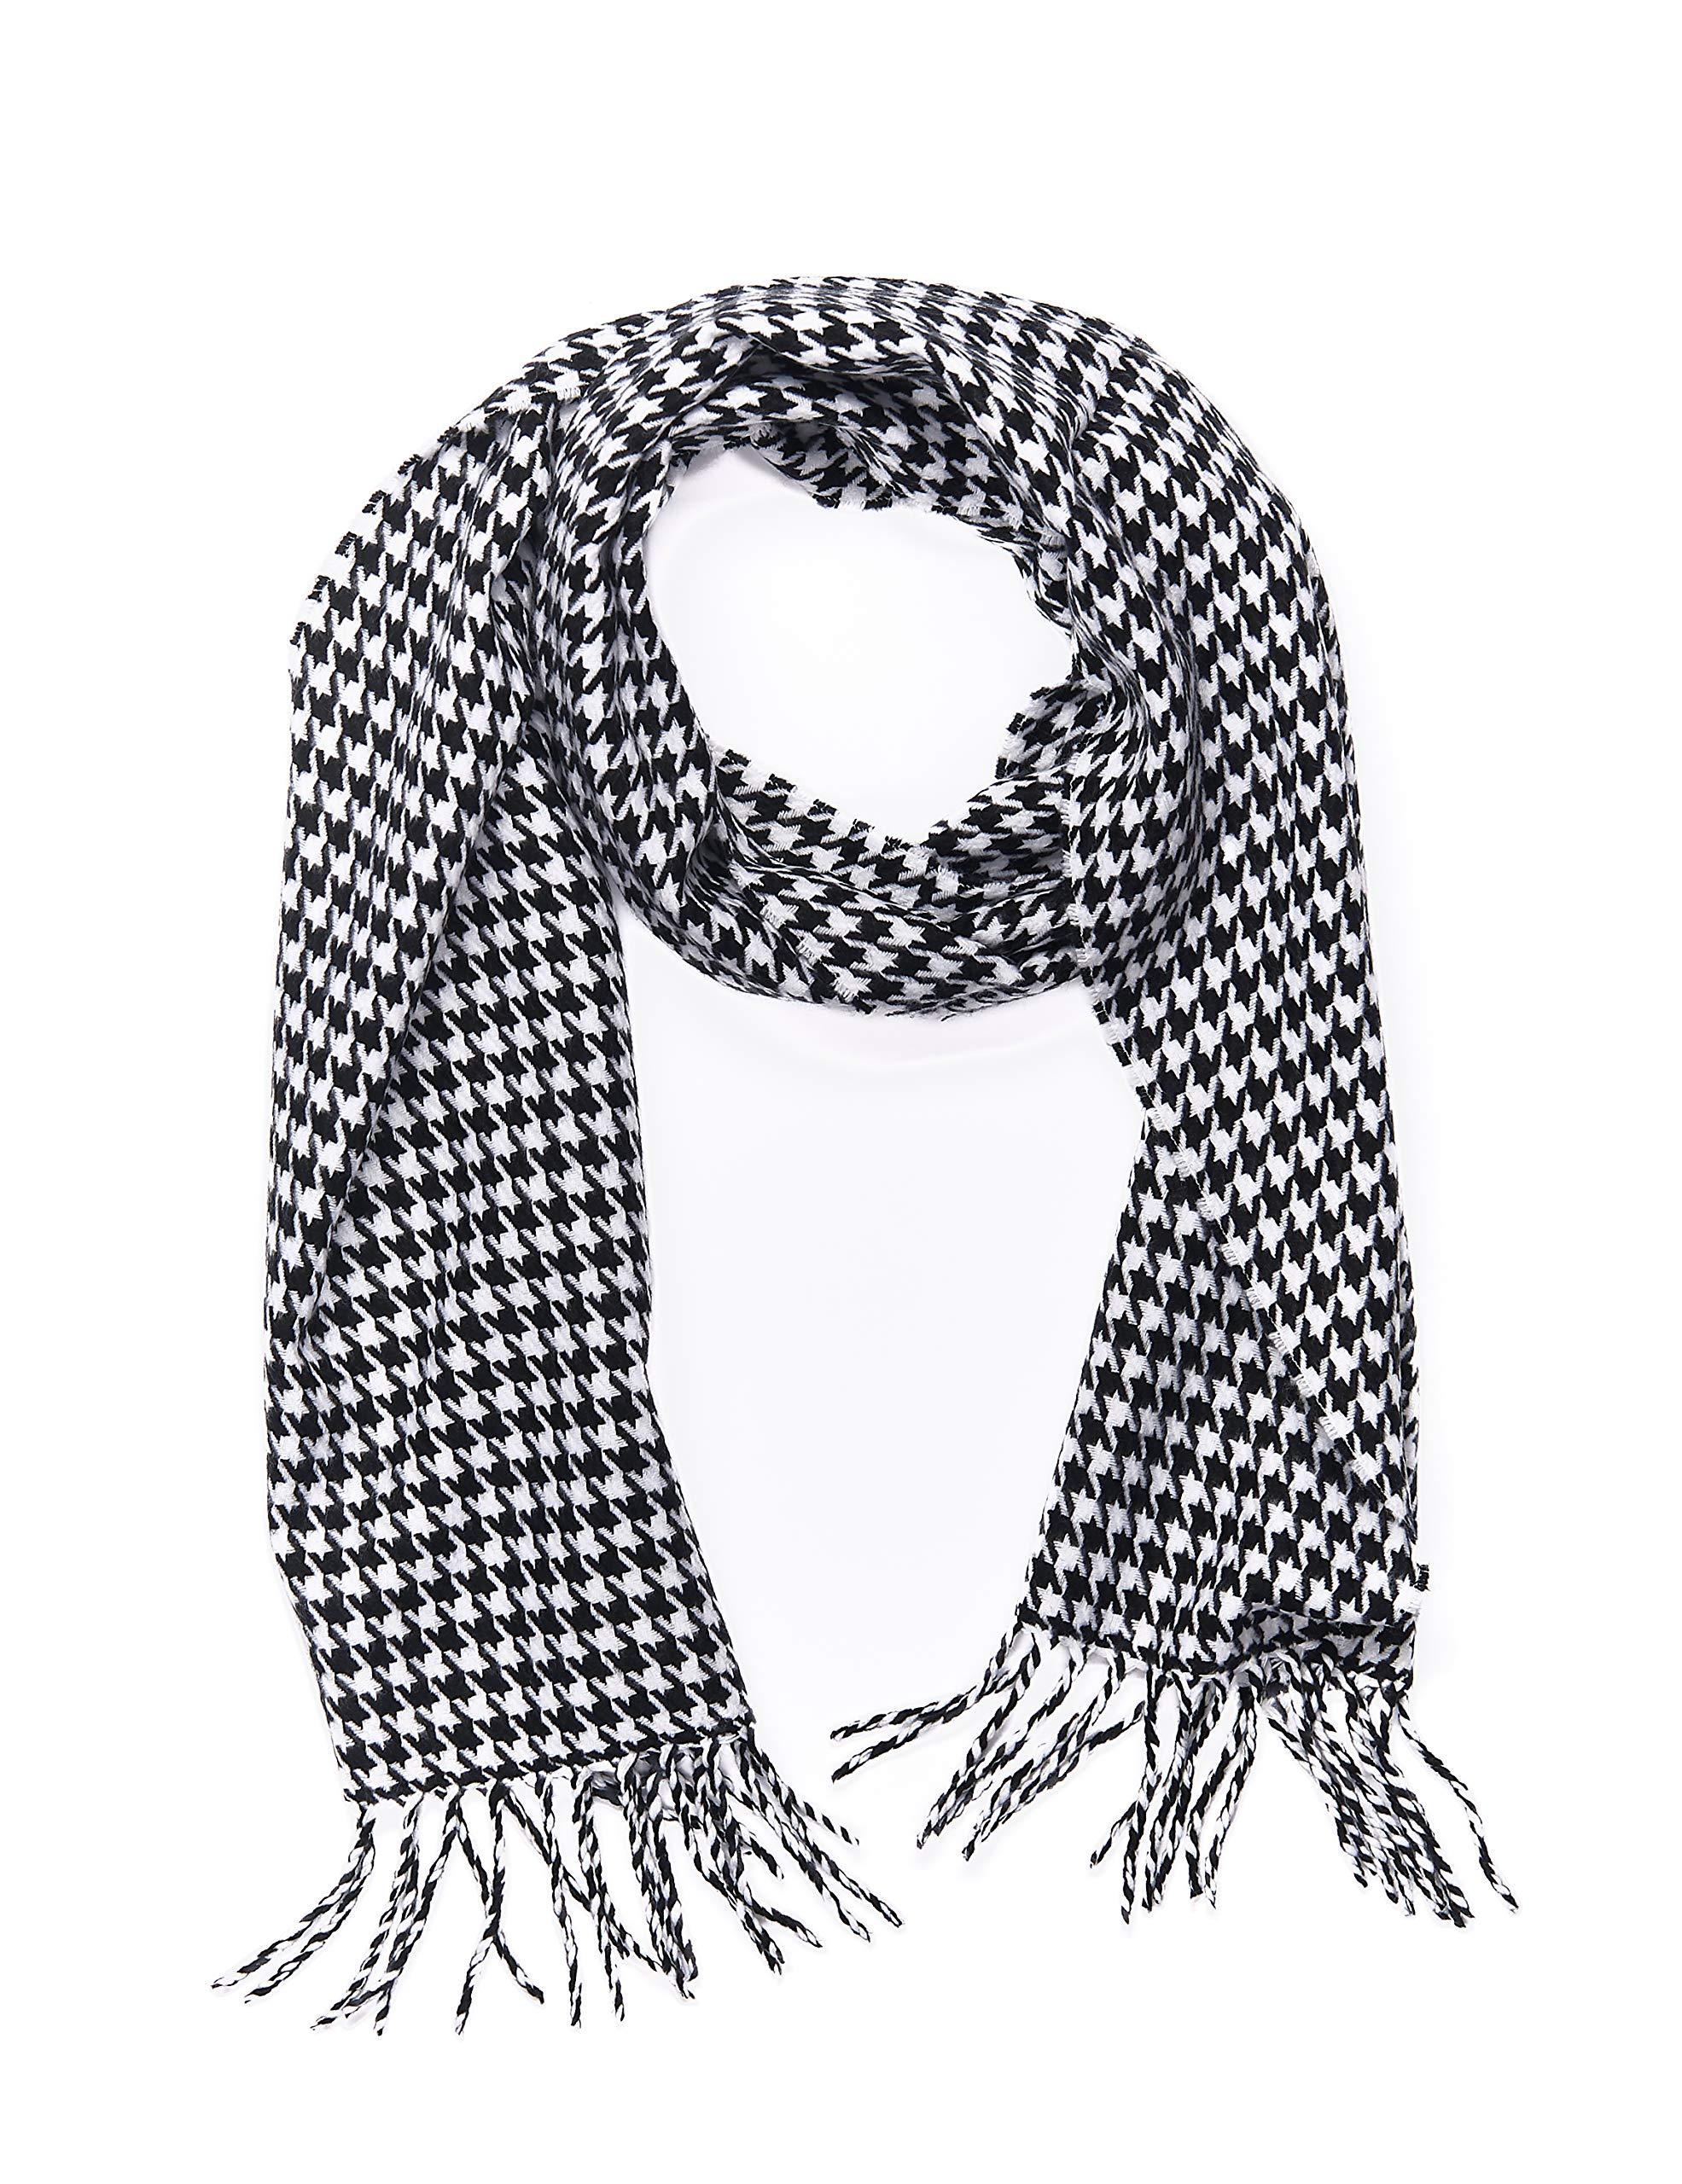 INVERNO Super Soft Luxurious Cashmere Feel Warm Winter Pattern Design Unisex Scarf (Black White Houndstooth)